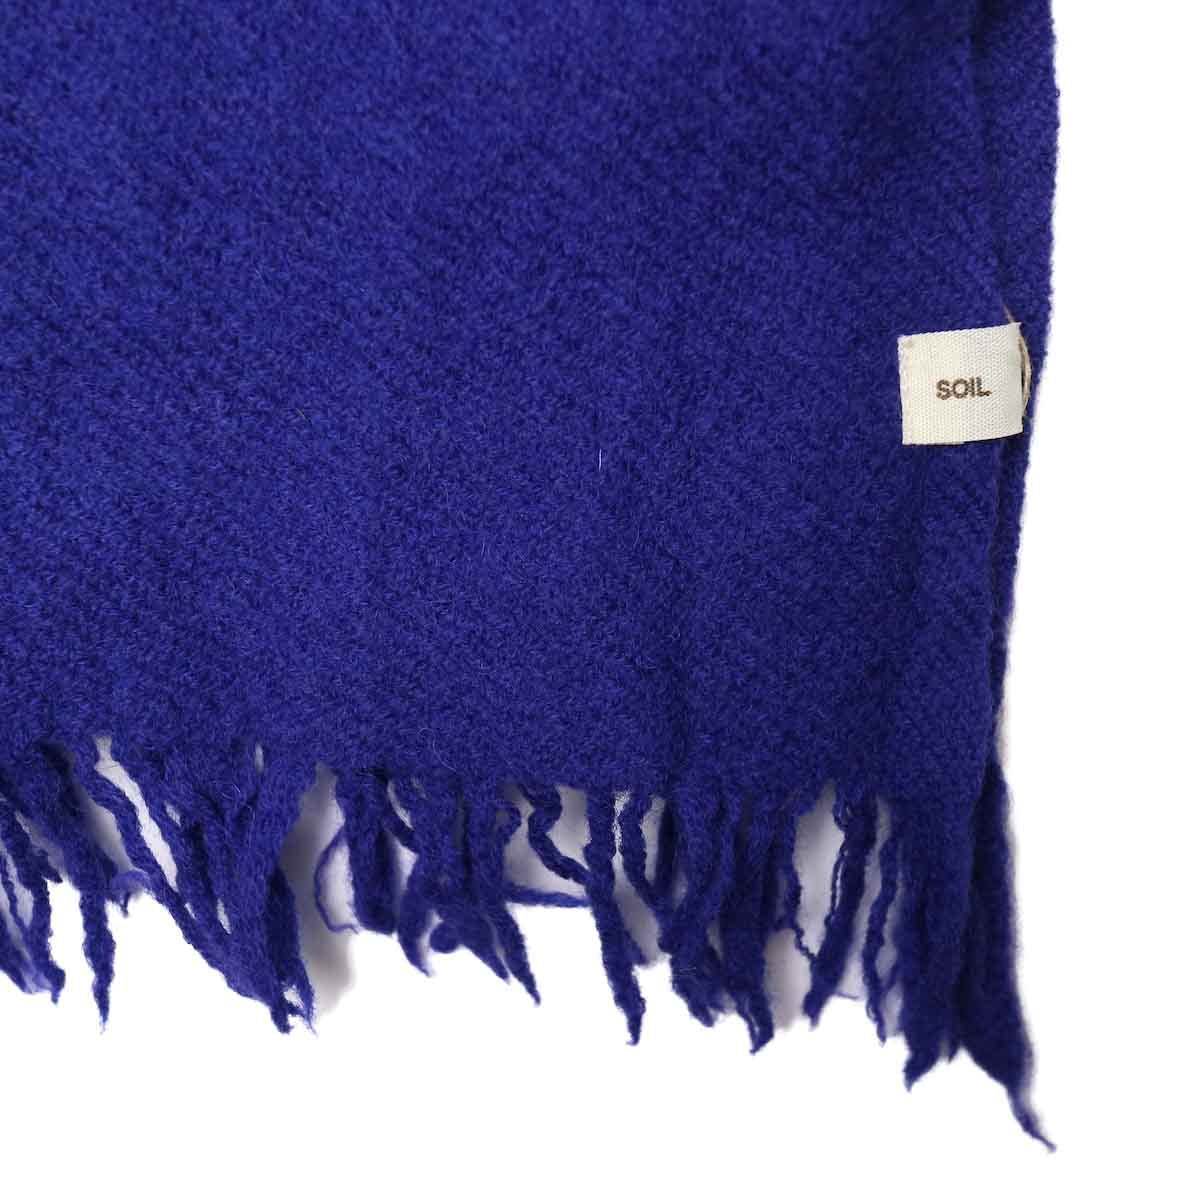 SOIL / MELANGE BOILED WOOL PLAIN STOLE (Purple) フリンジ・生地感